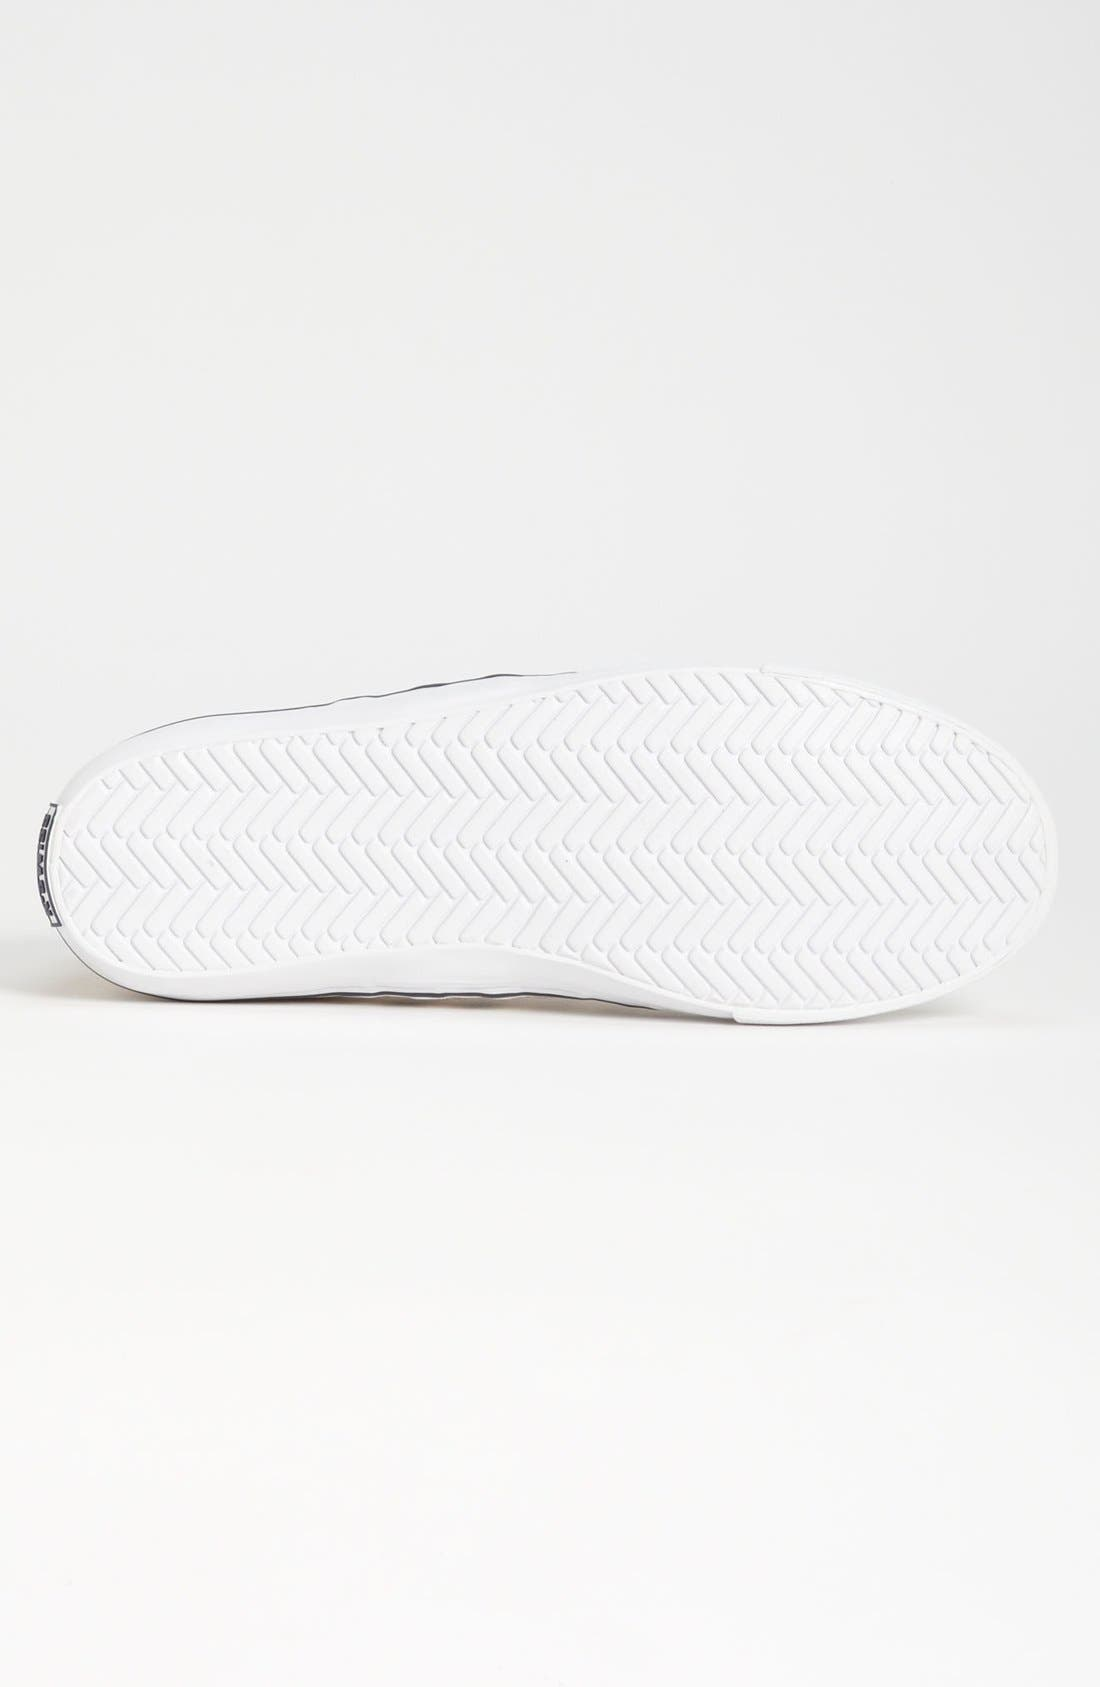 'Billy Reid Venice' Suede Sneaker,                             Alternate thumbnail 3, color,                             052